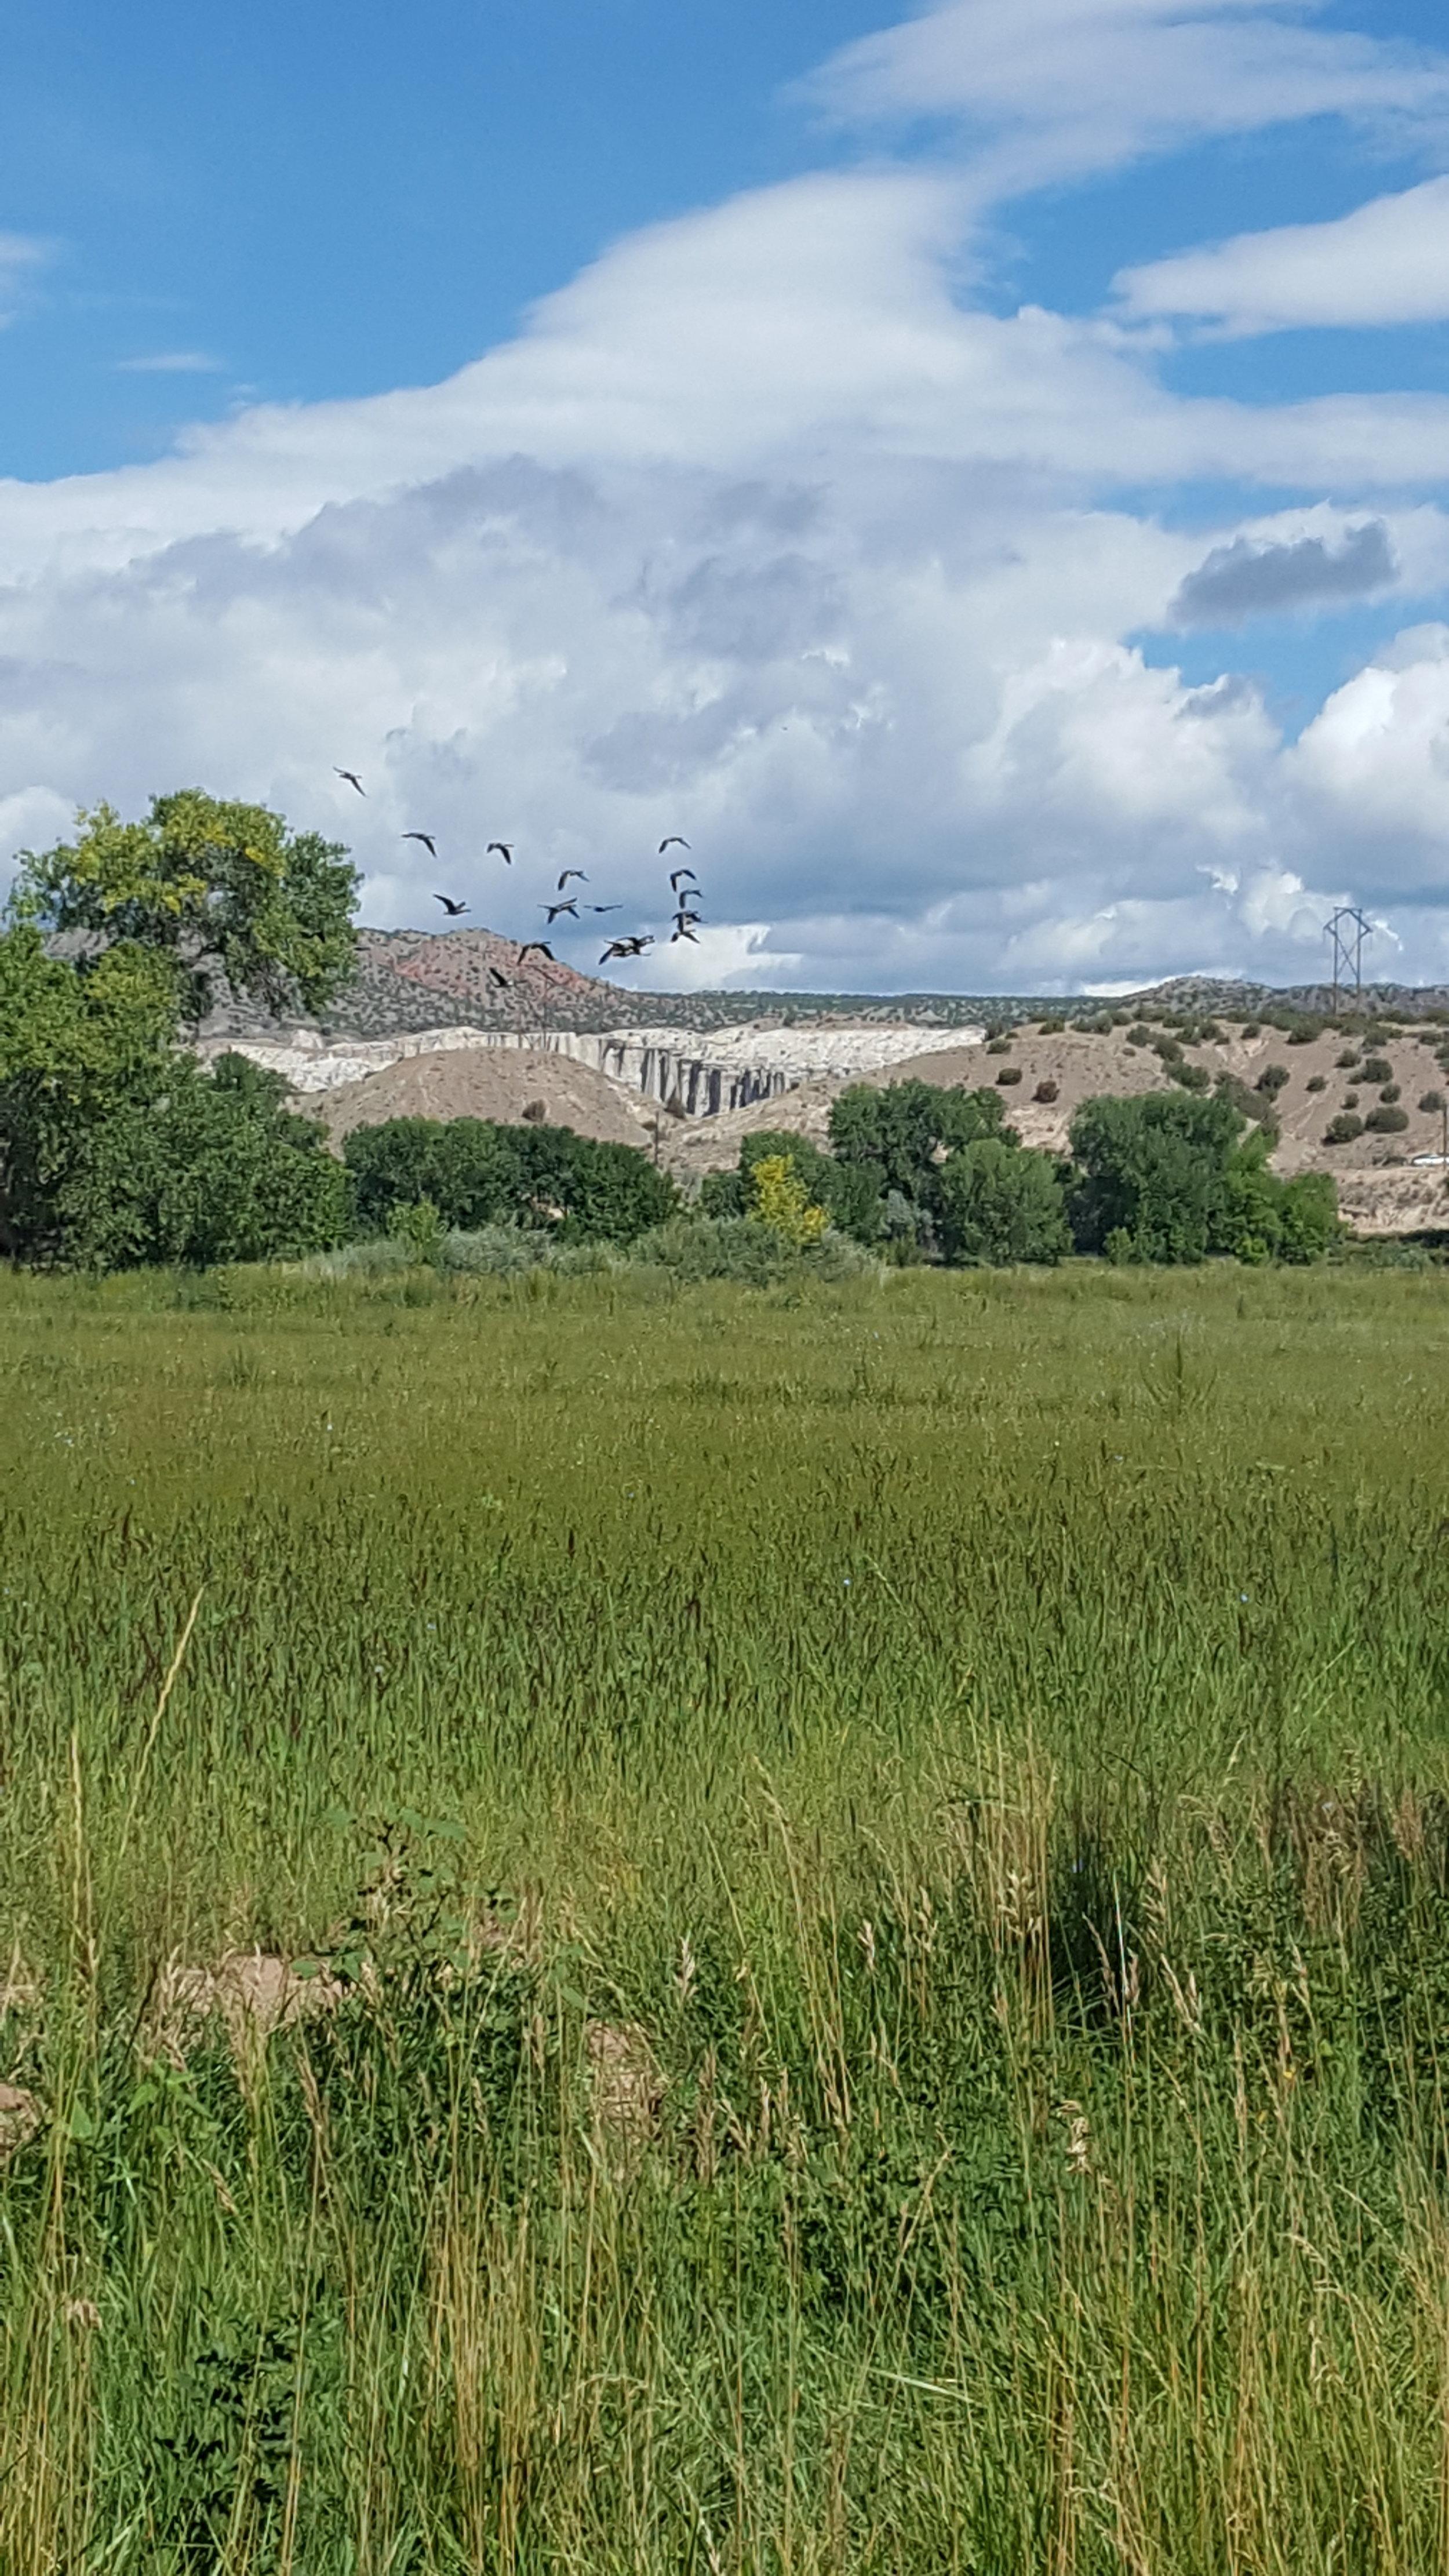 Forage grasses and Plaza Blanca on the horizon